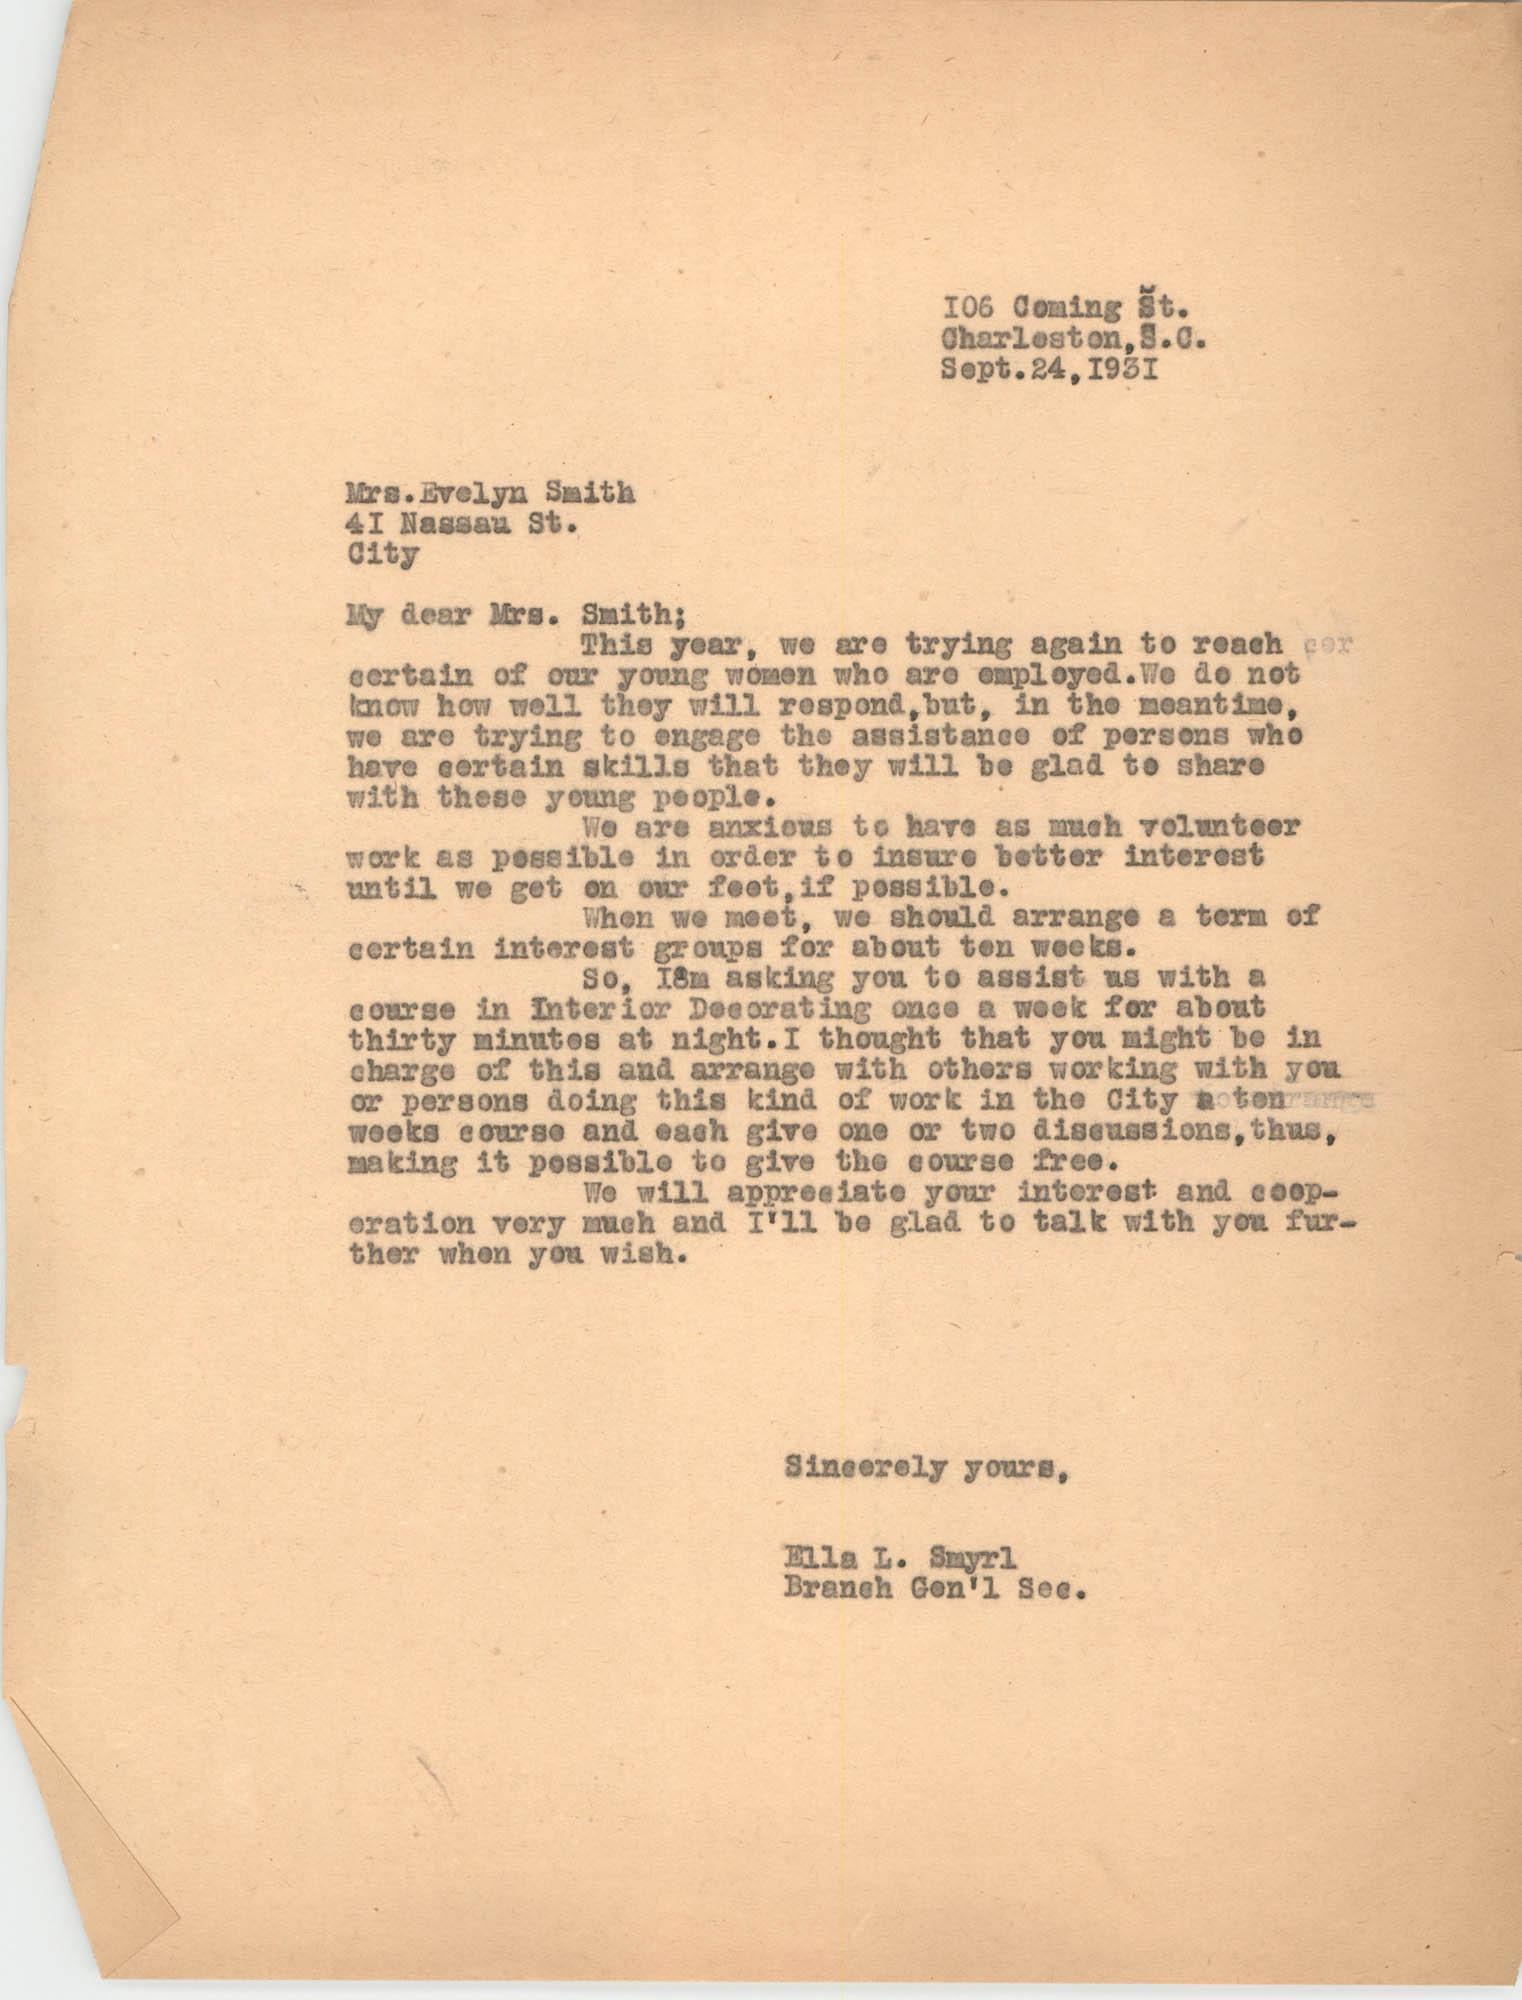 Letter from Ella L. Smyrl to Evelyn Smith, September 24, 1931